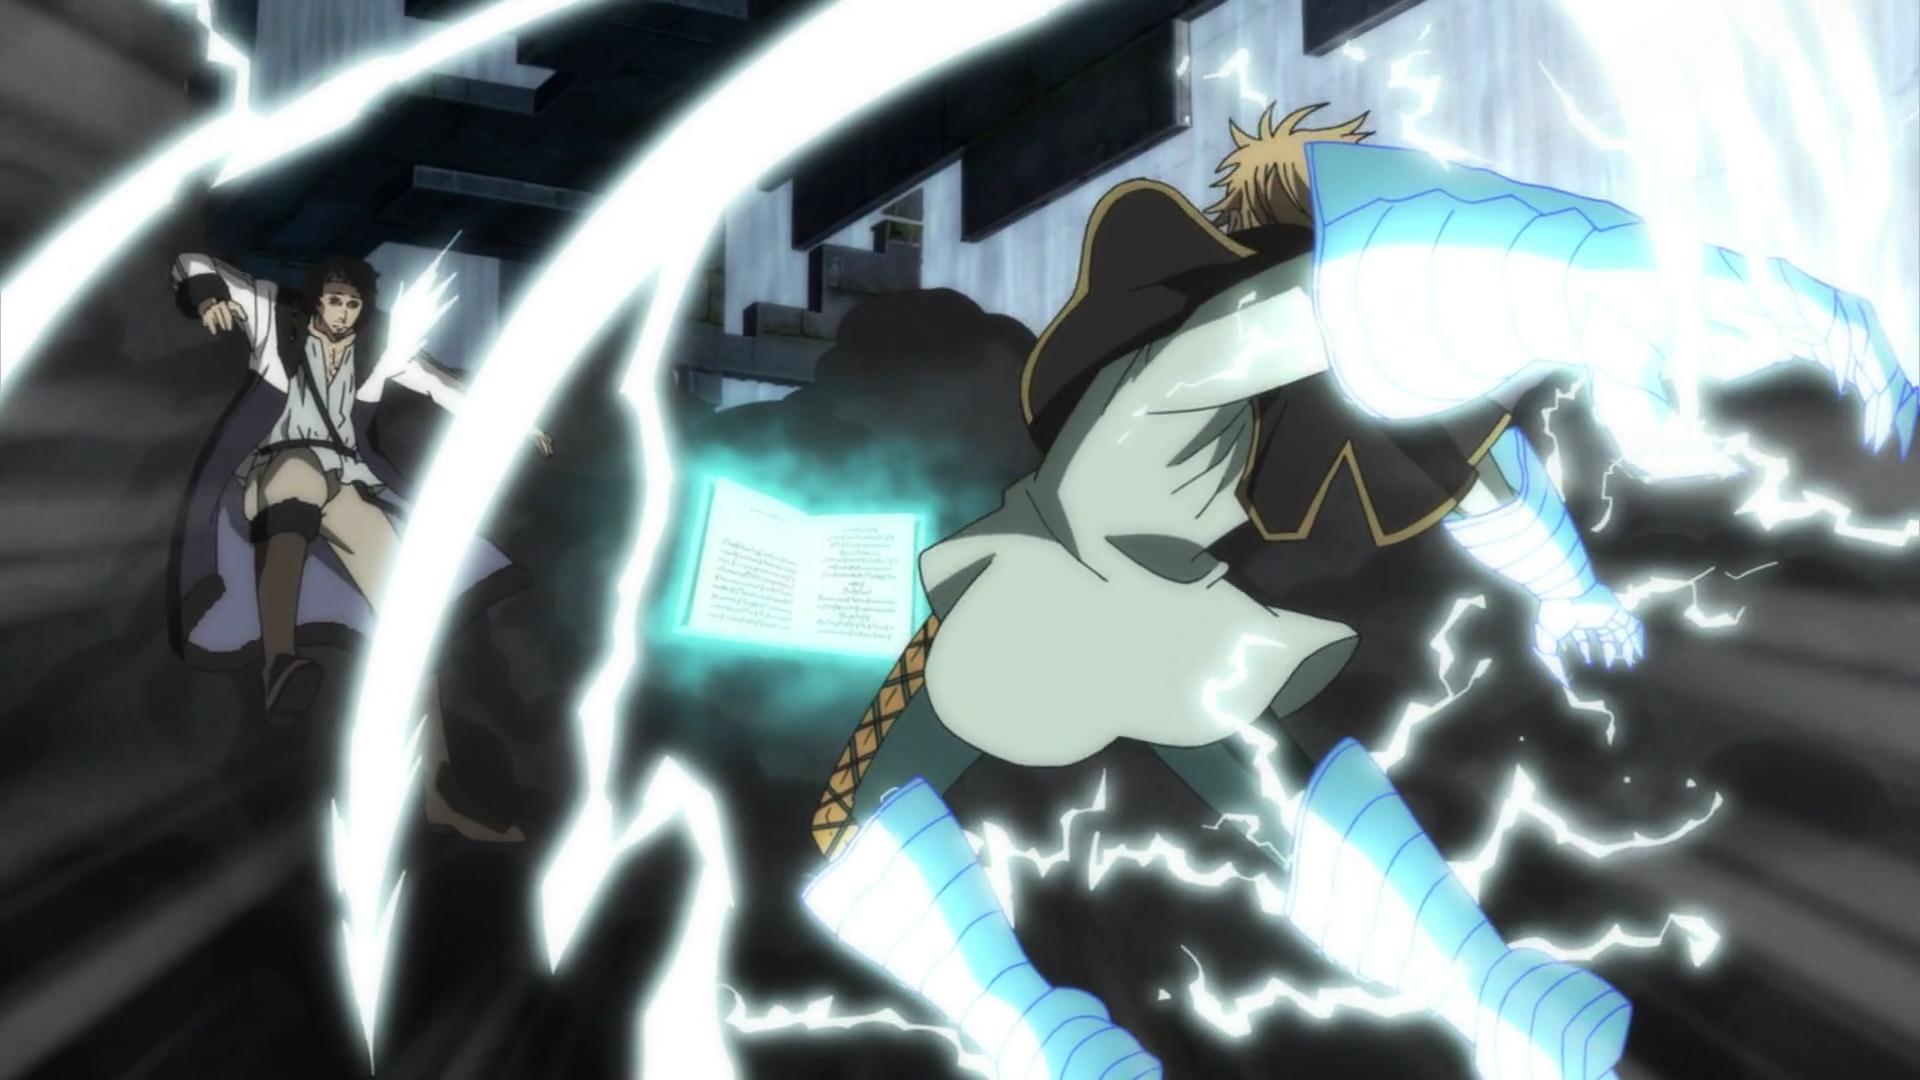 Lightning Magic Black Clover Wiki Fandom Powered By Wikia